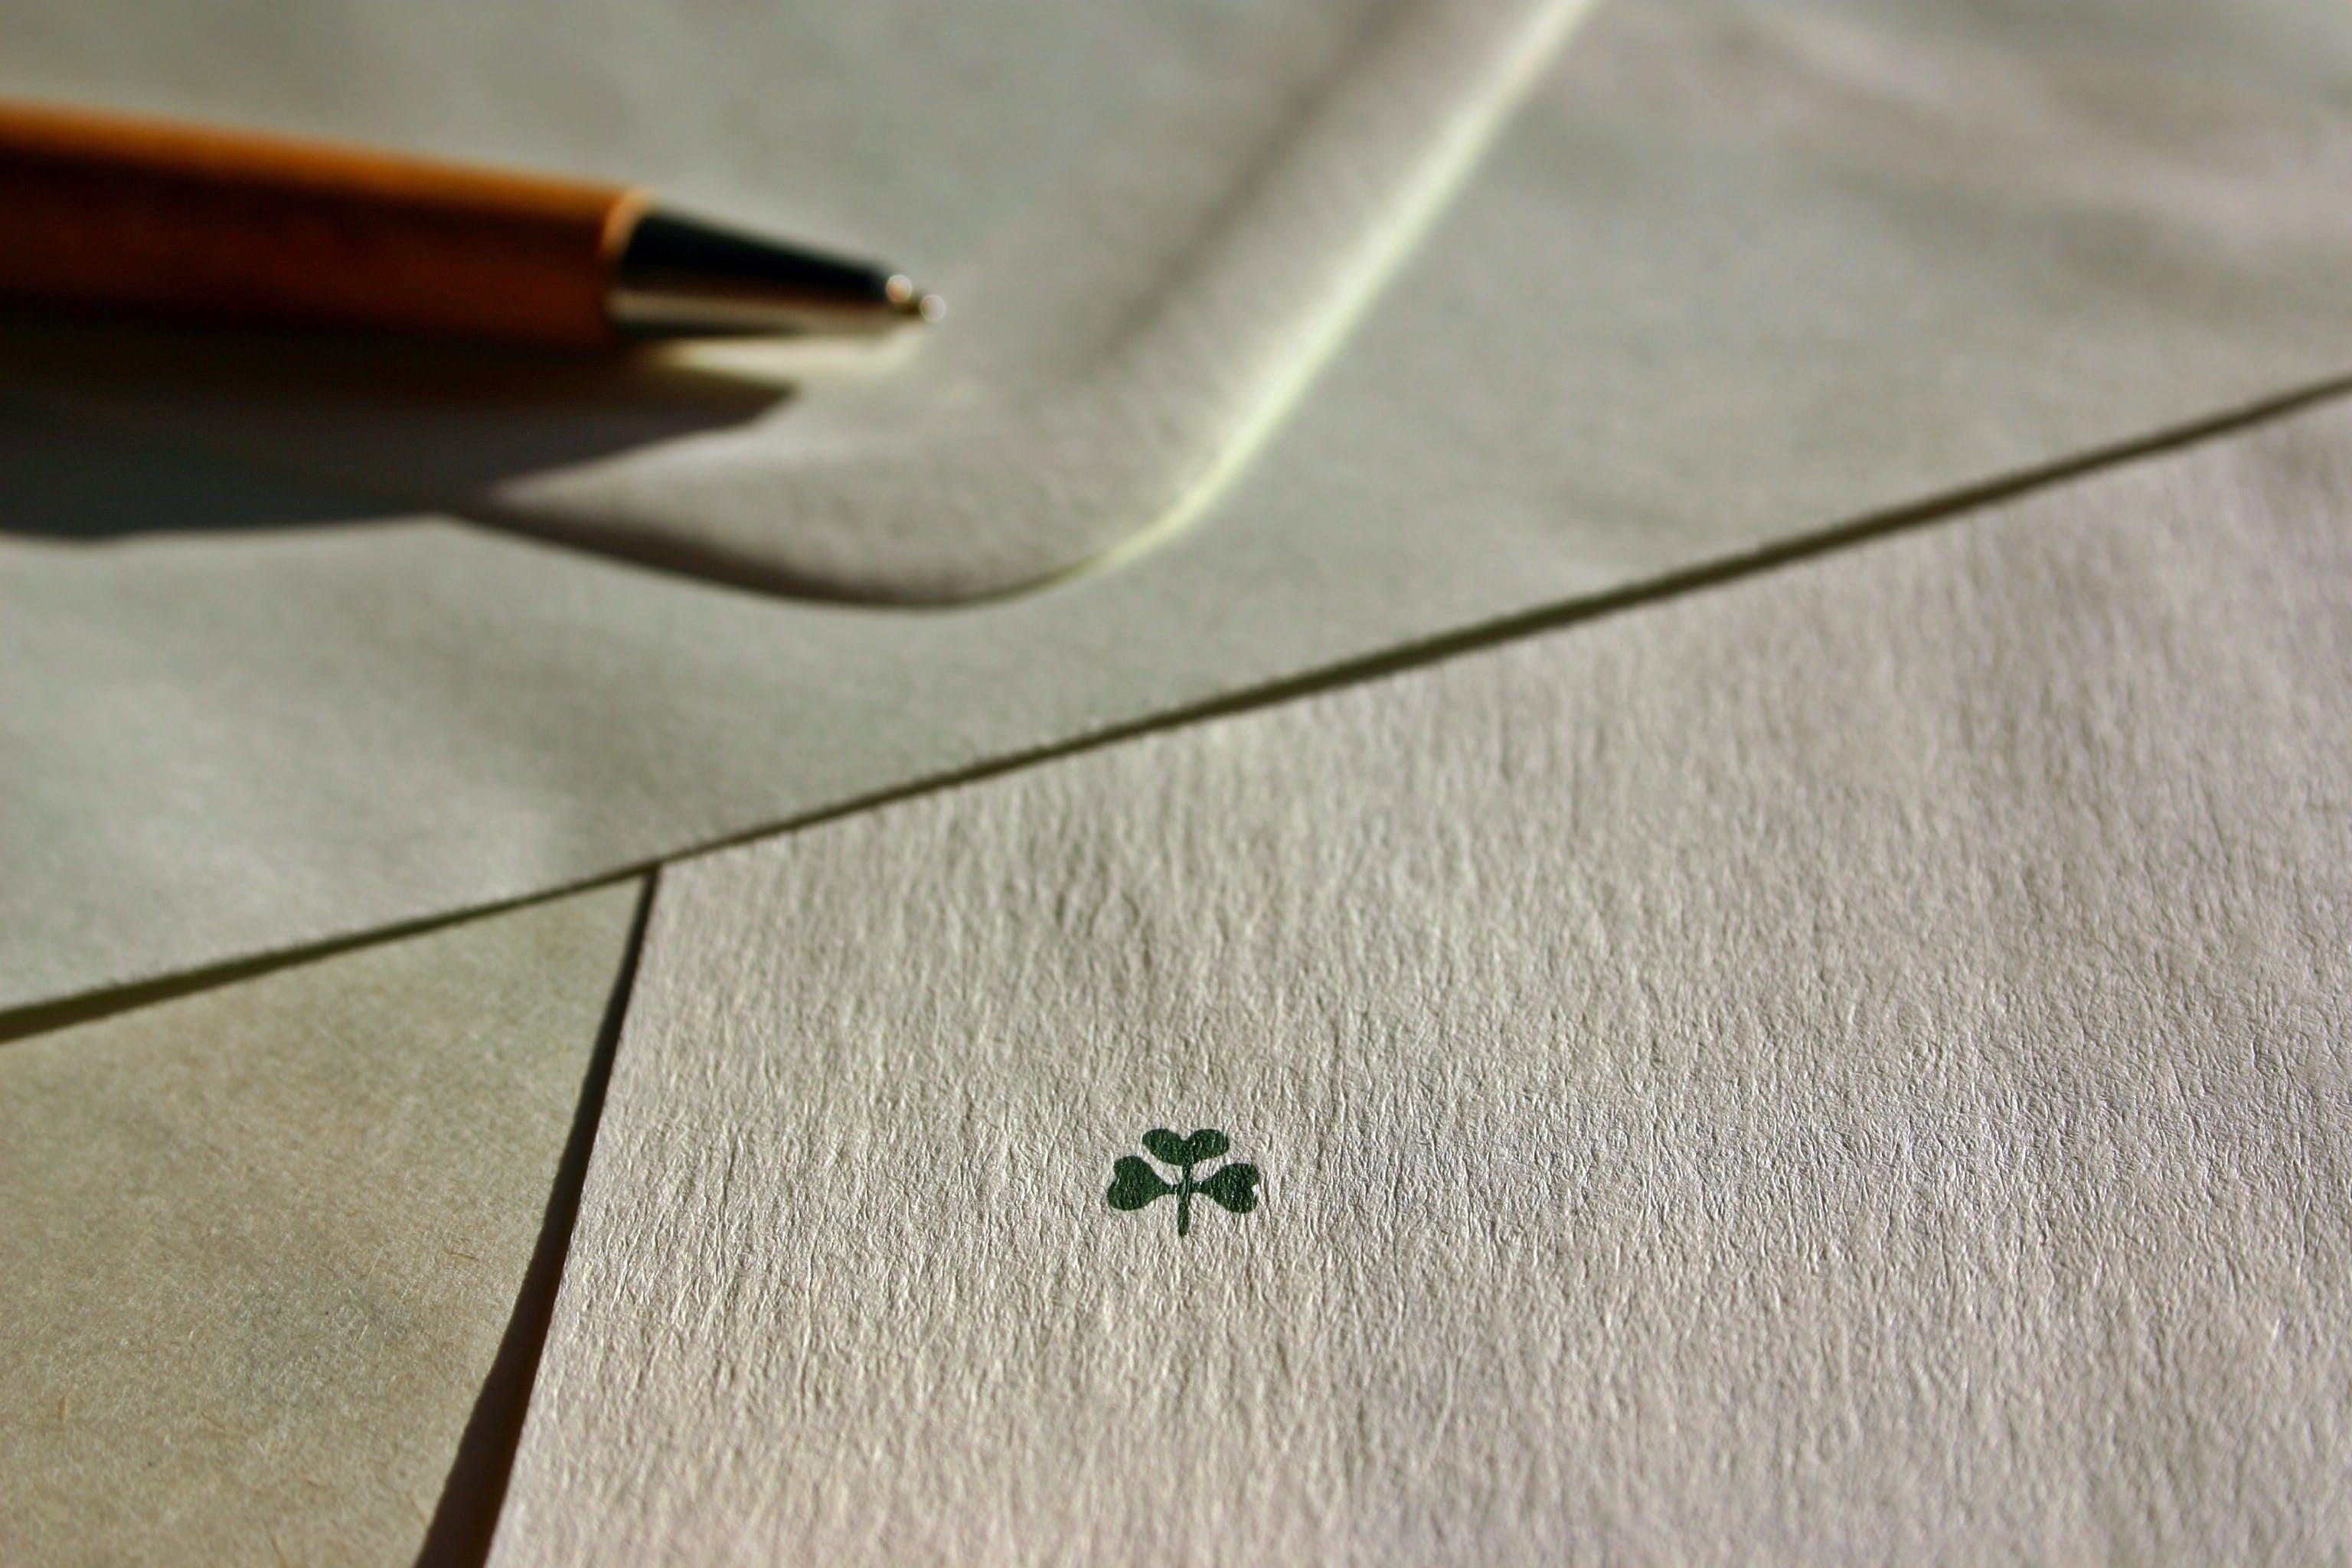 Fotos de stock gratuitas de afortunado, bolígrafo, símbolo, suerte